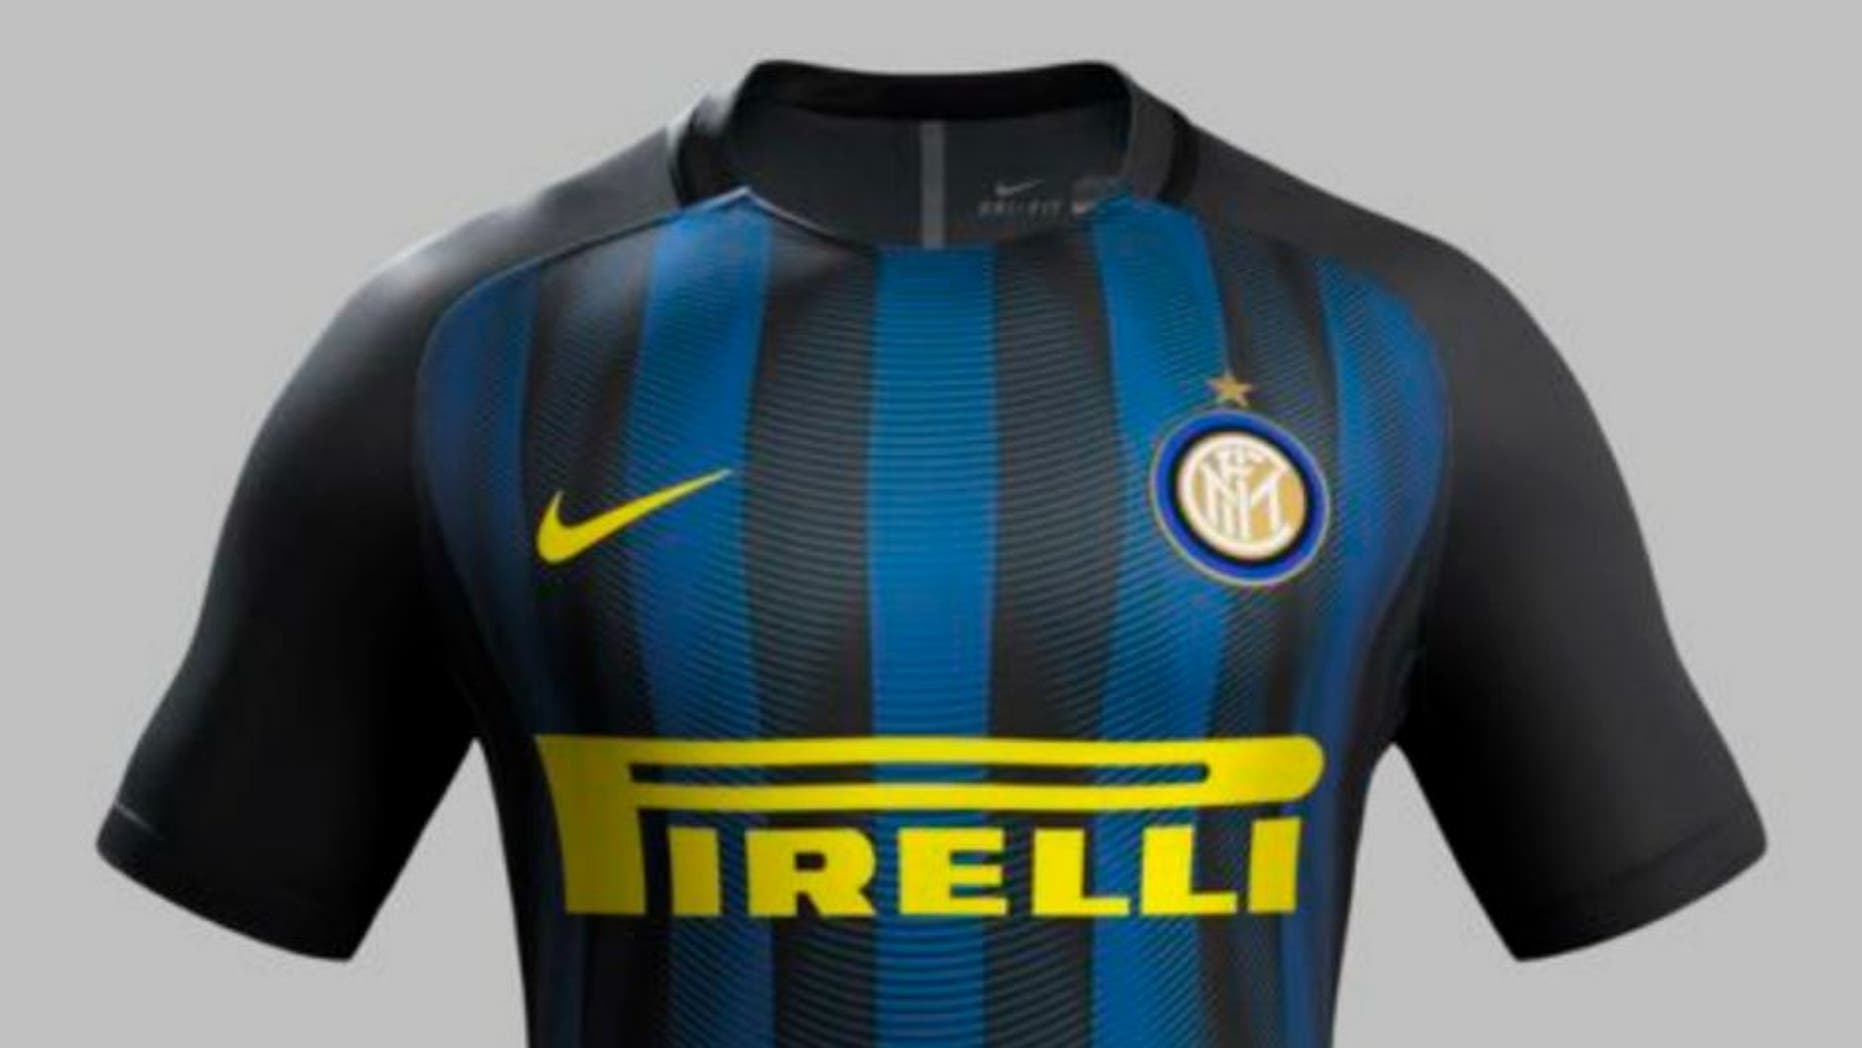 sale retailer 706c7 4db81 Check out Inter Milan's gorgeous new kits | Fox News